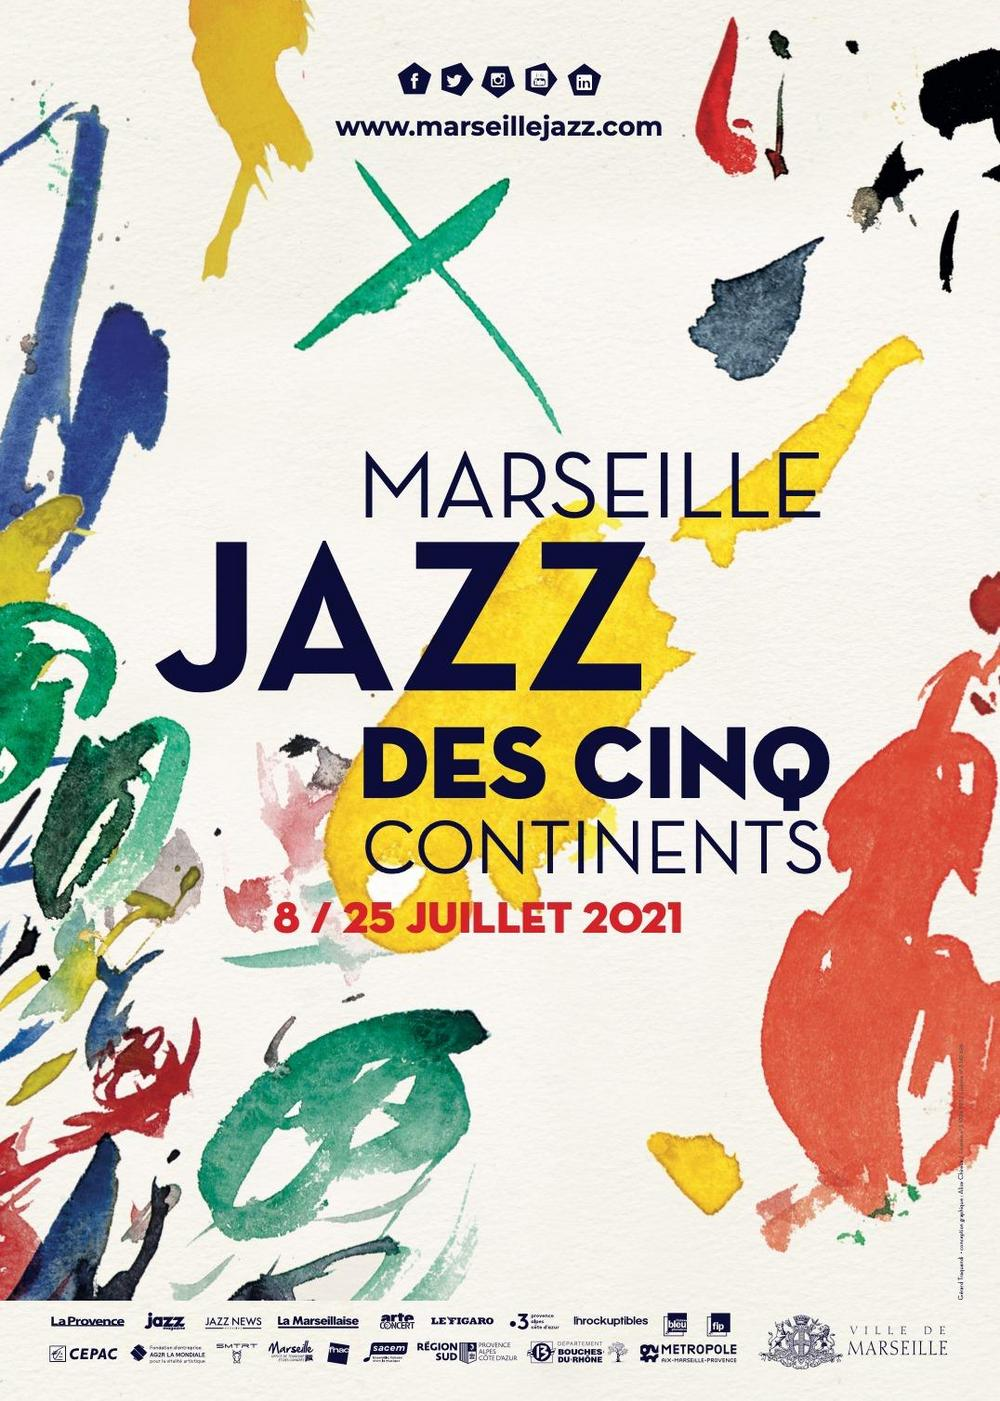 Marseille Jazz des cinq continents 2021